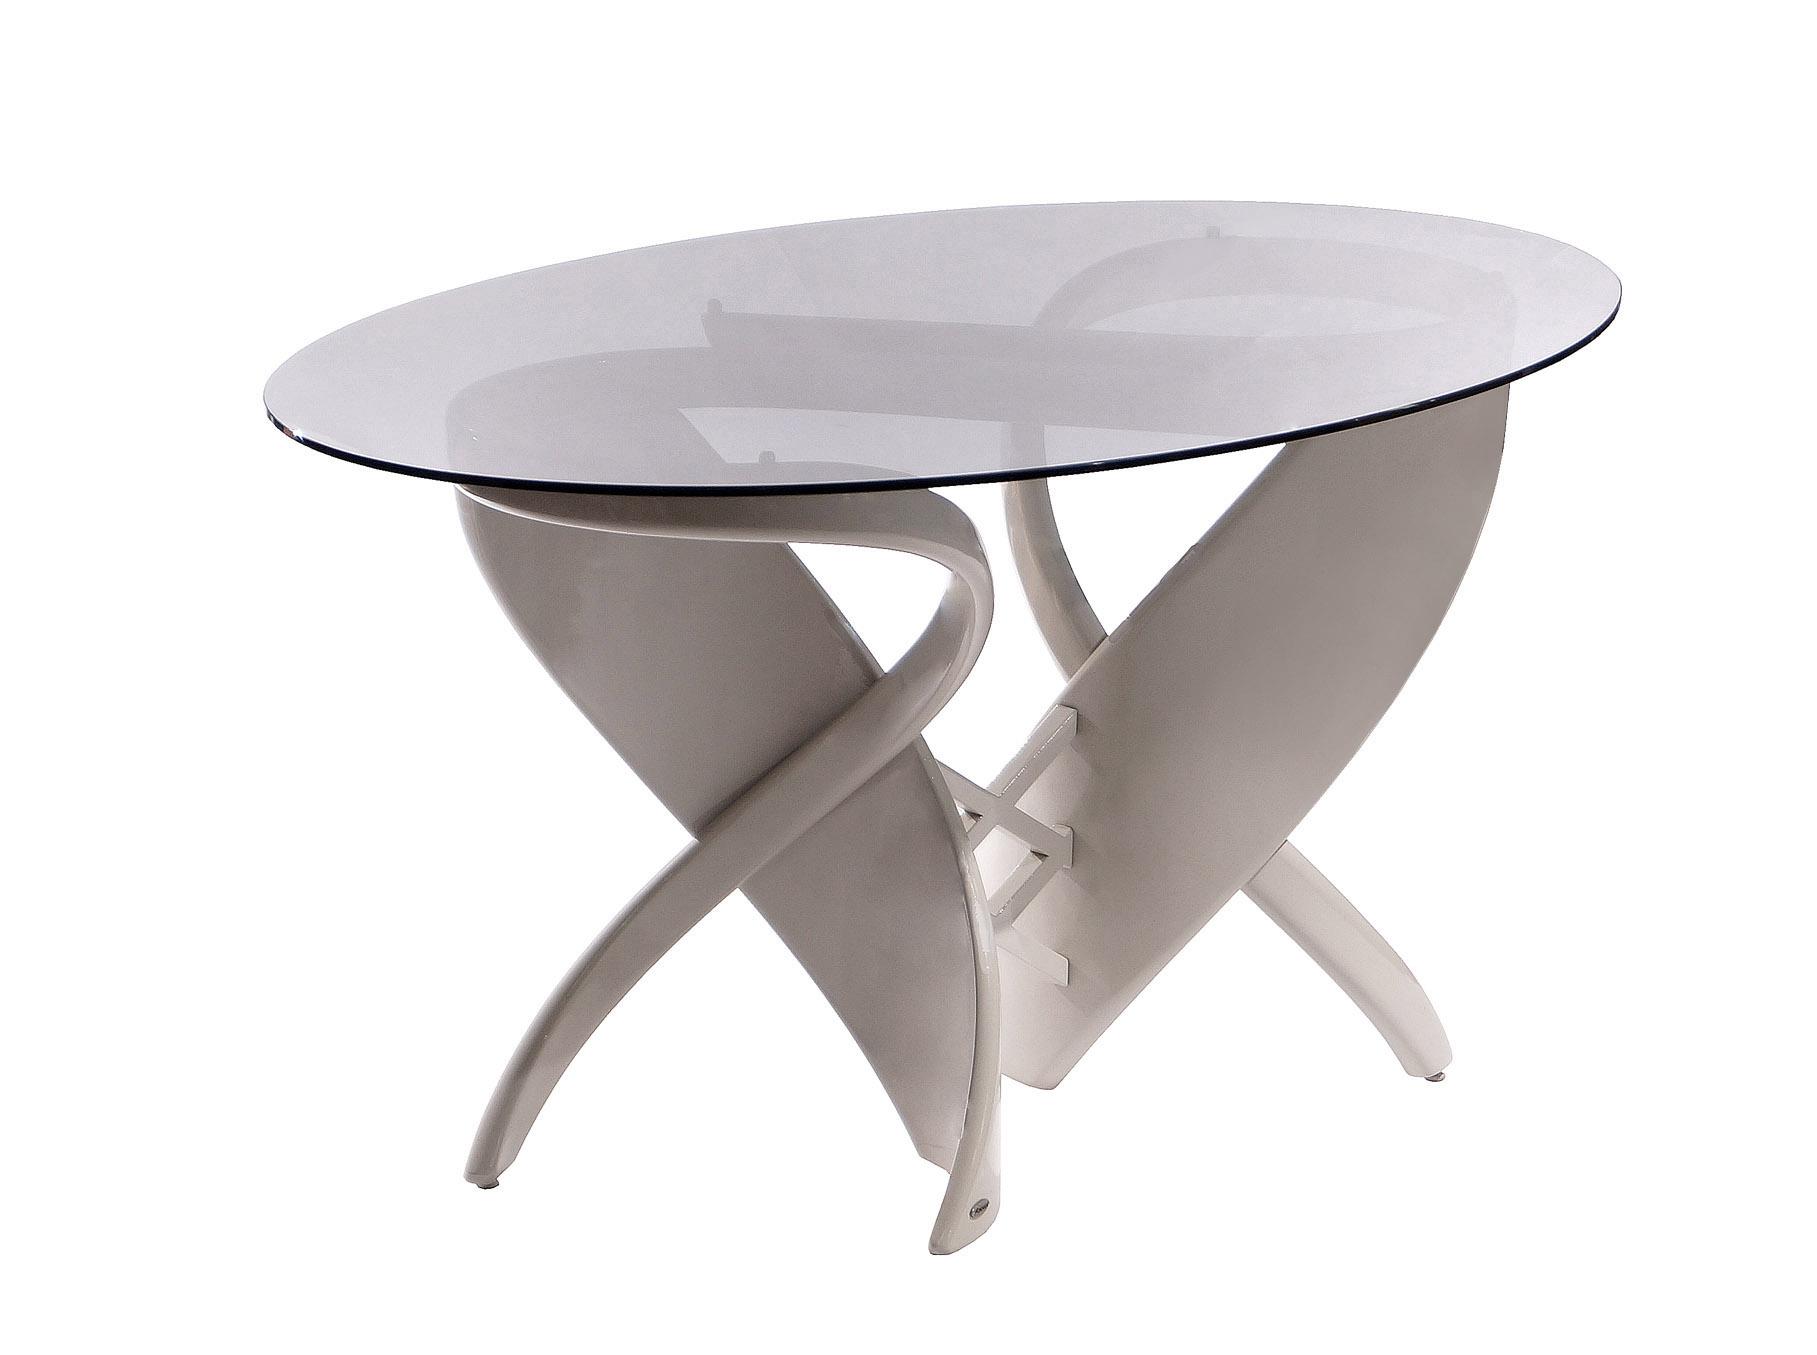 Кухонный стол ActualDesign 9981428 от thefurnish